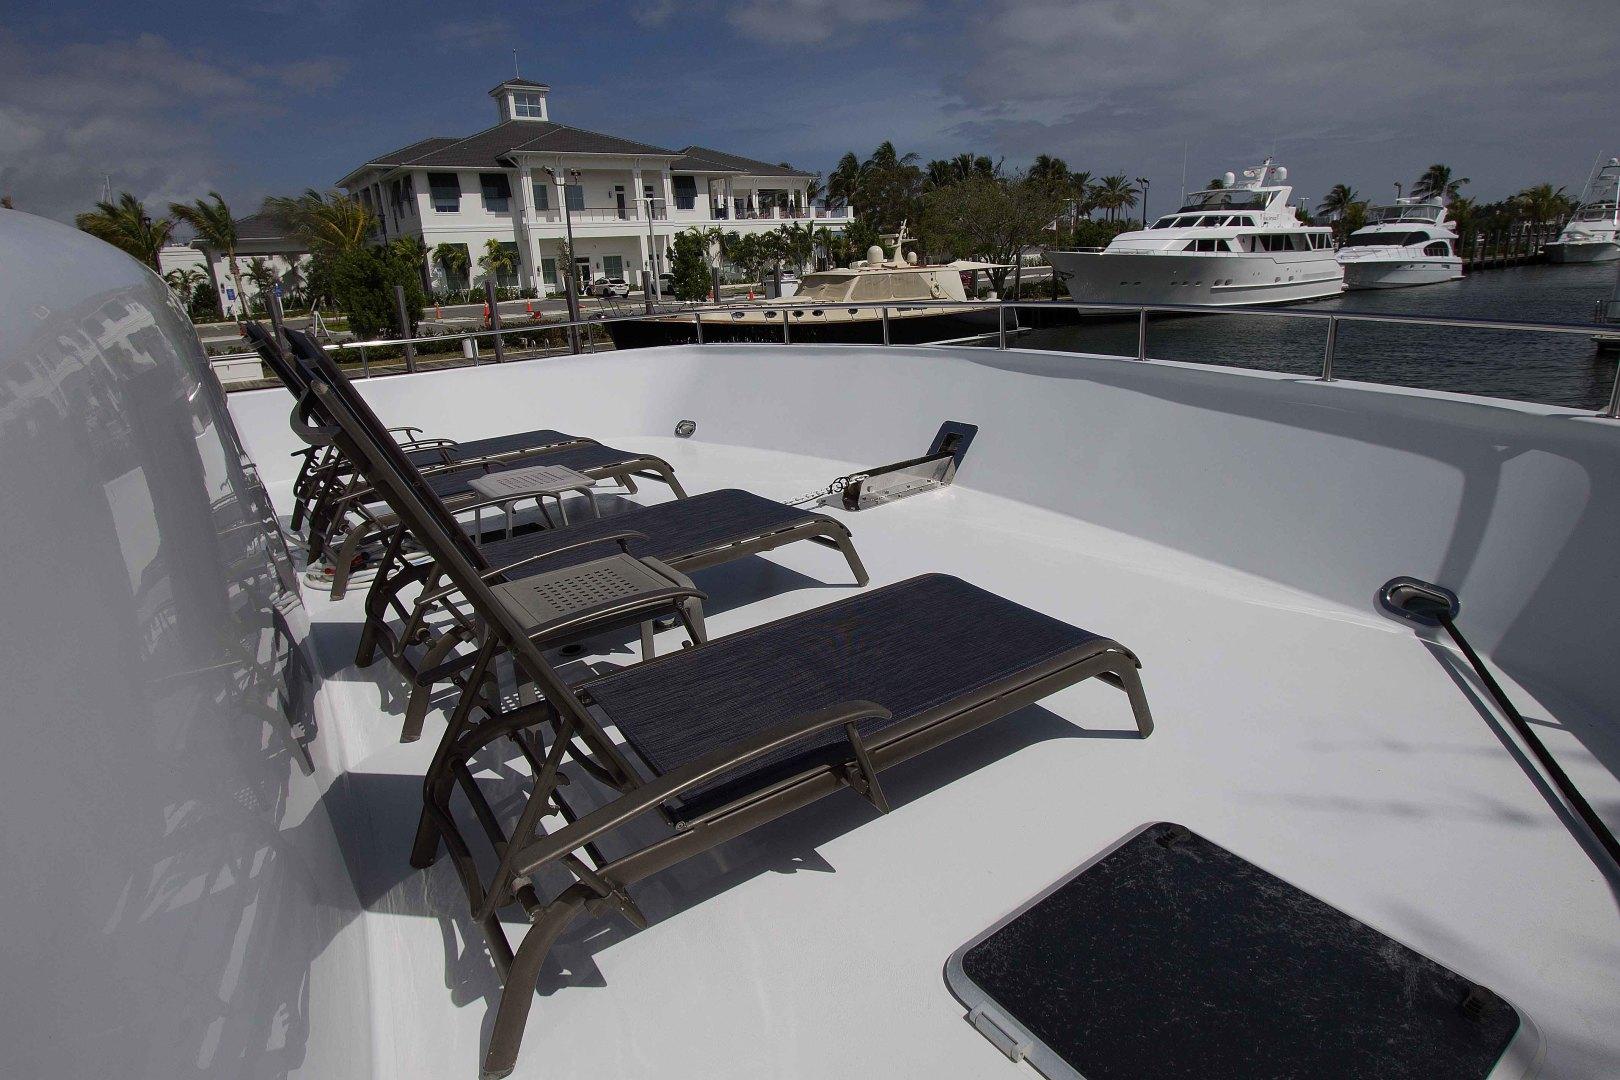 Theriault & Son-Custom Catamaran 2000-Slumber Venture Fort Lauderdale-Florida-United States-1625419 | Thumbnail